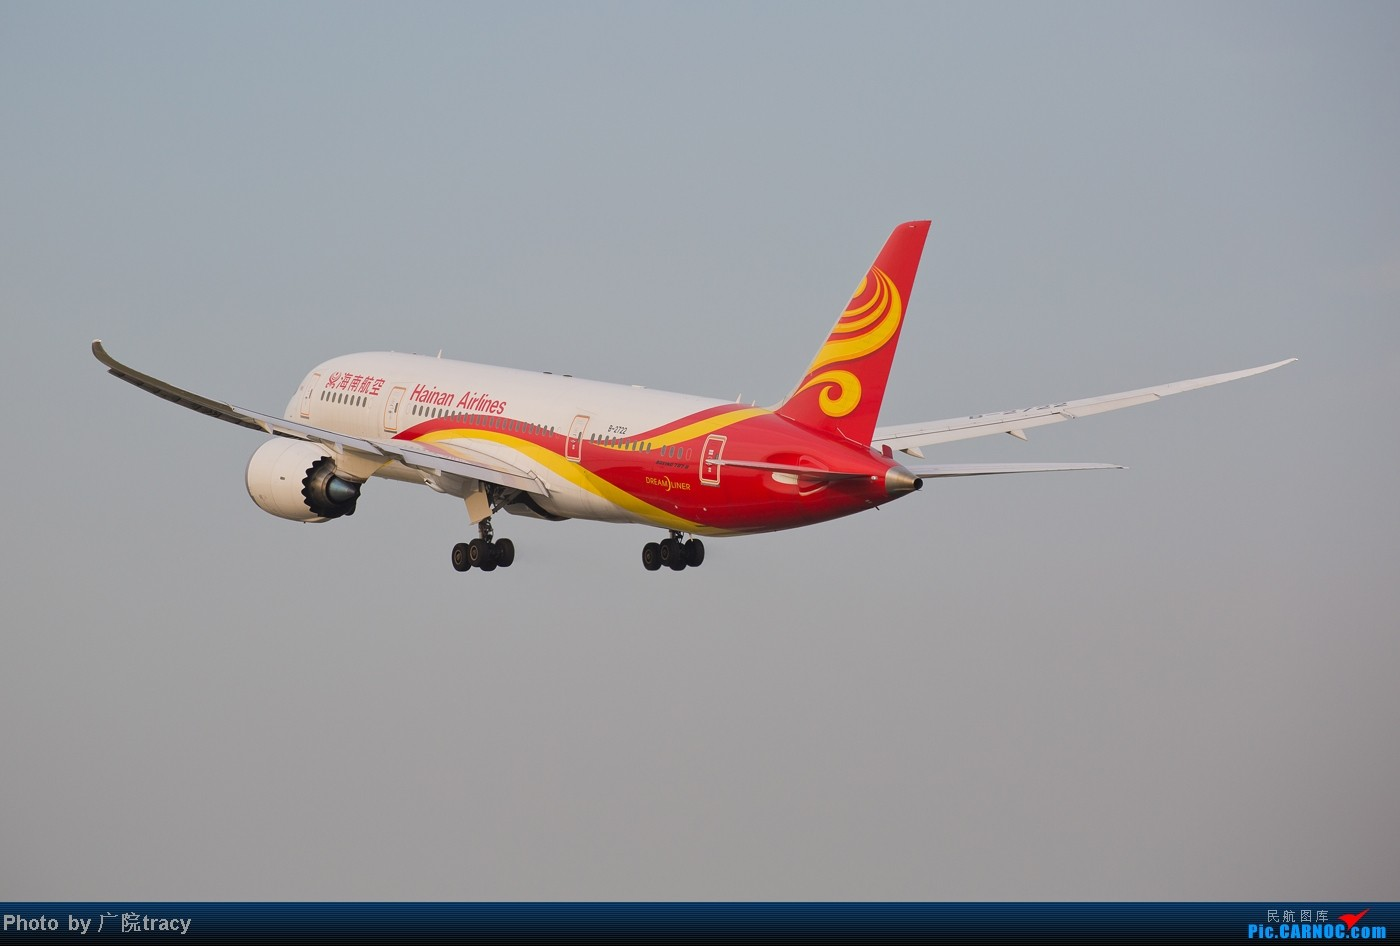 Re:[原创]★ ★ ★ ★ ★目前已经拍到了9家航空公司的波音787梦想客机★ ★ ★ ★ ★ BOEING 787 B-2722 中国北京首都机场